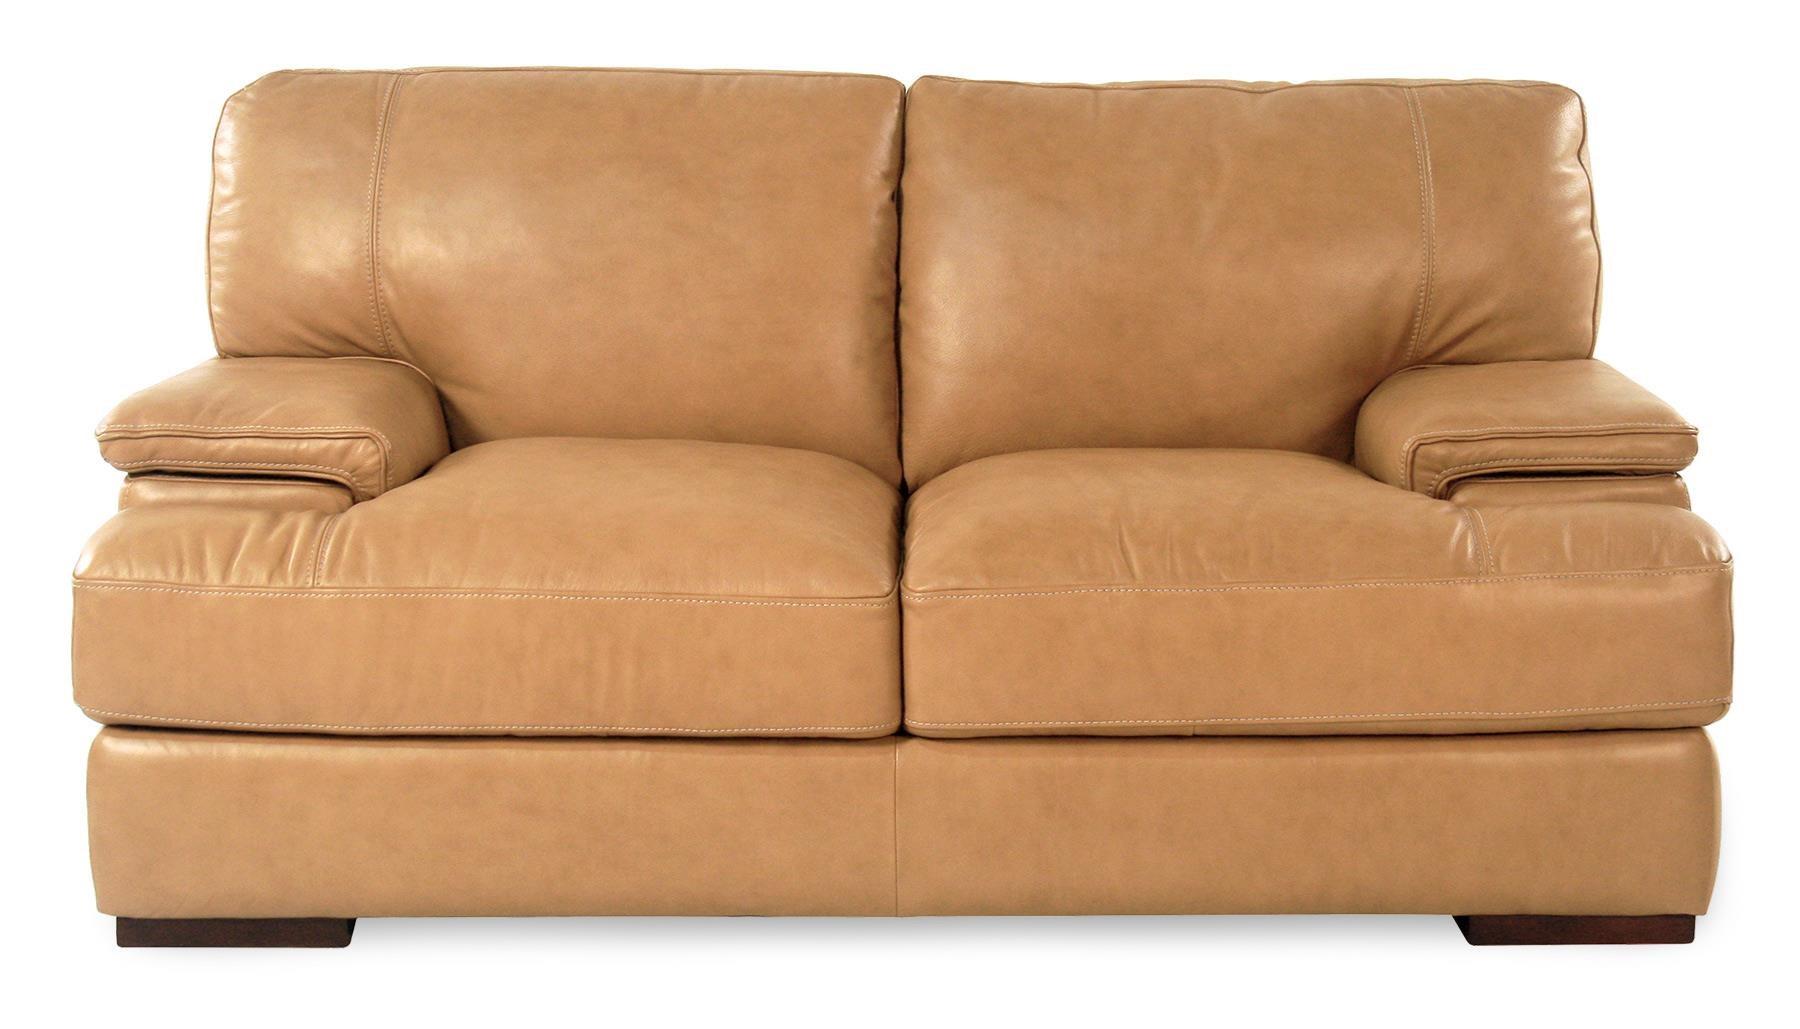 Loft Leather Nassau Leather Loveseat - Item Number: 10027-30-NASSAUTAN